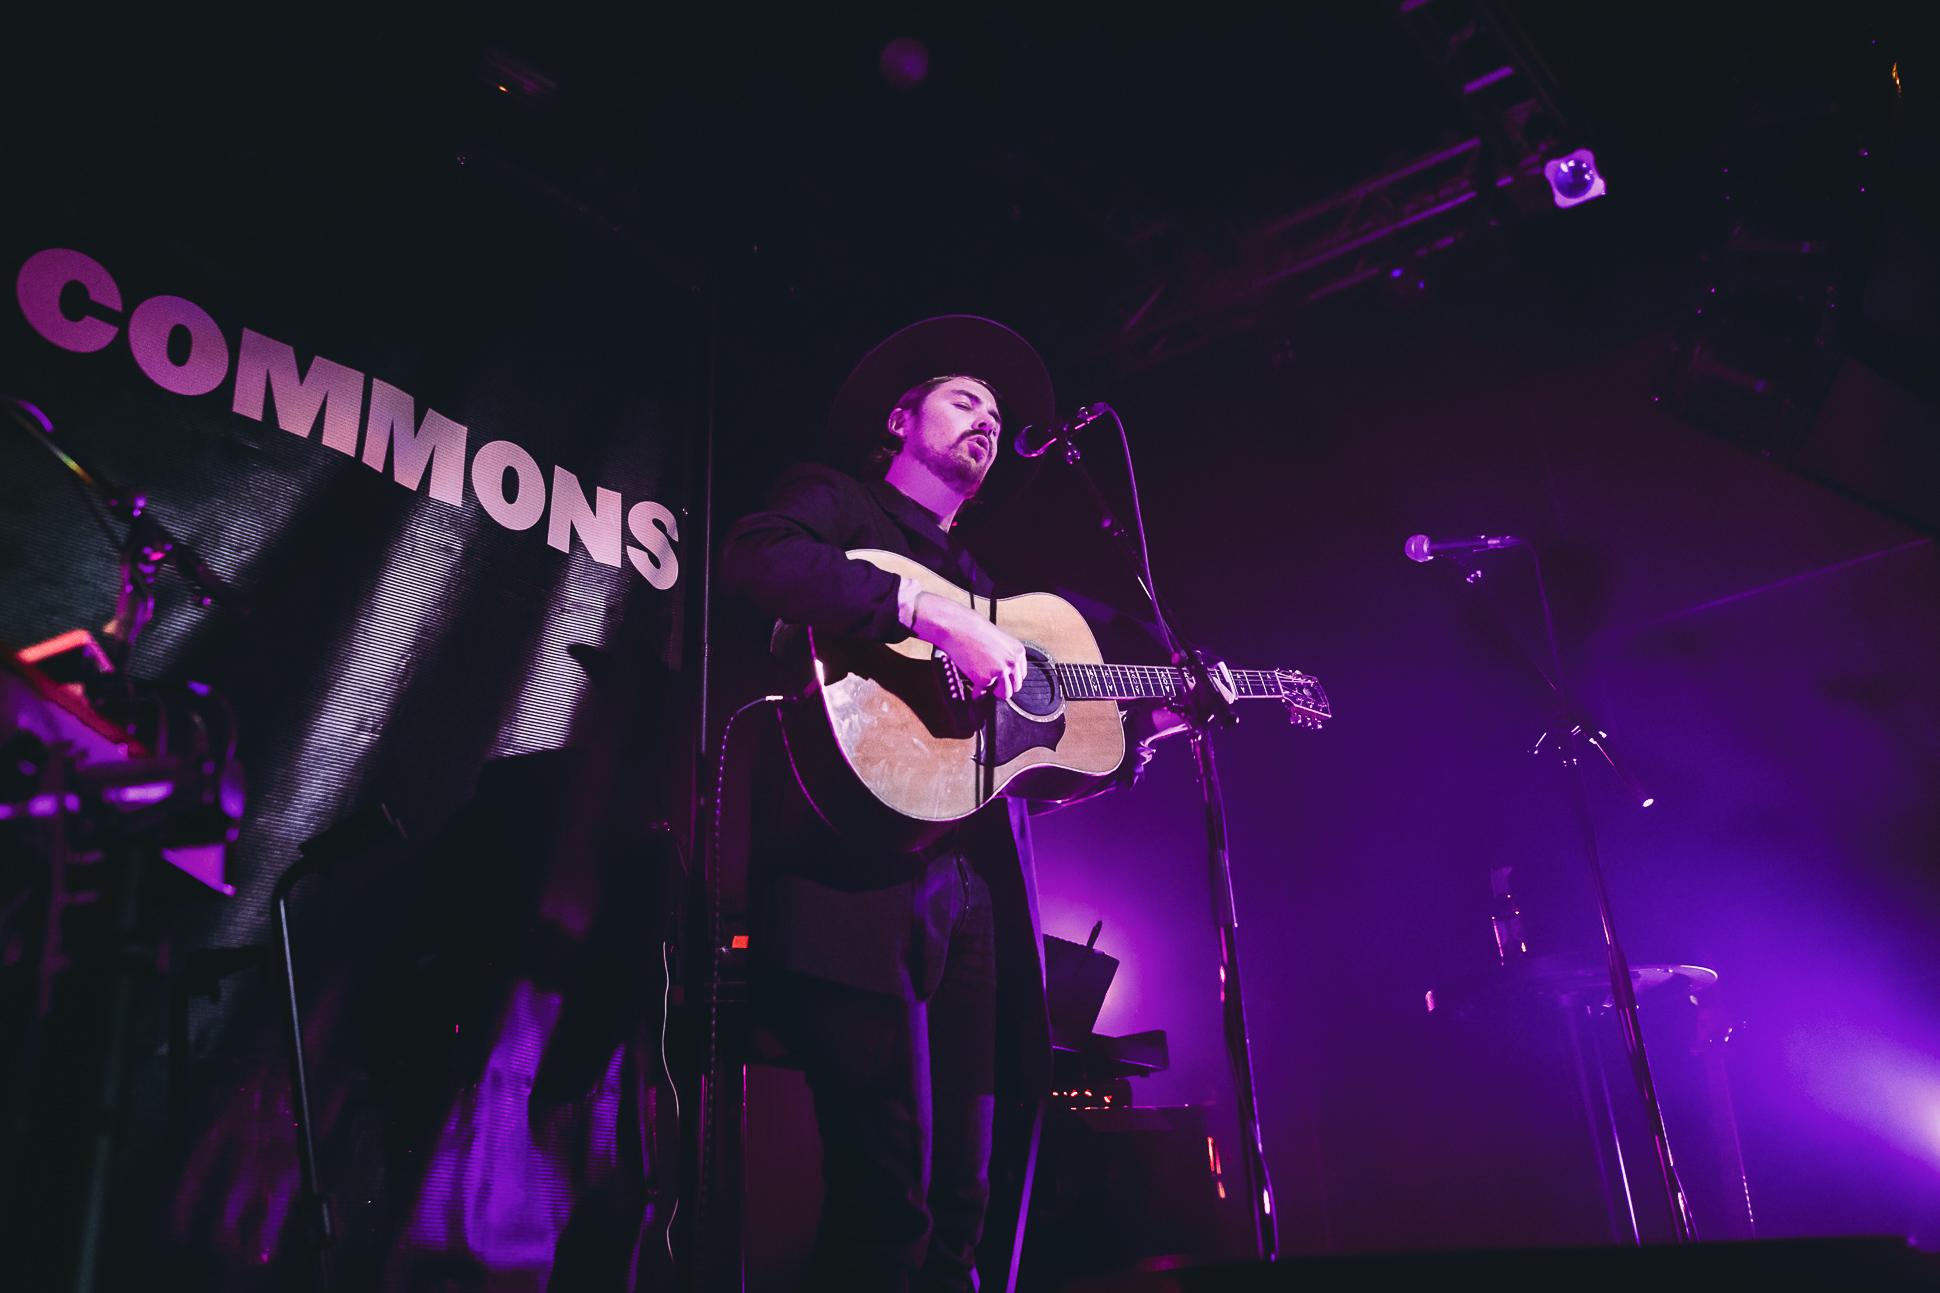 JamieNCommons-VENUE-19-01-2019-Vancouver-02.jpg